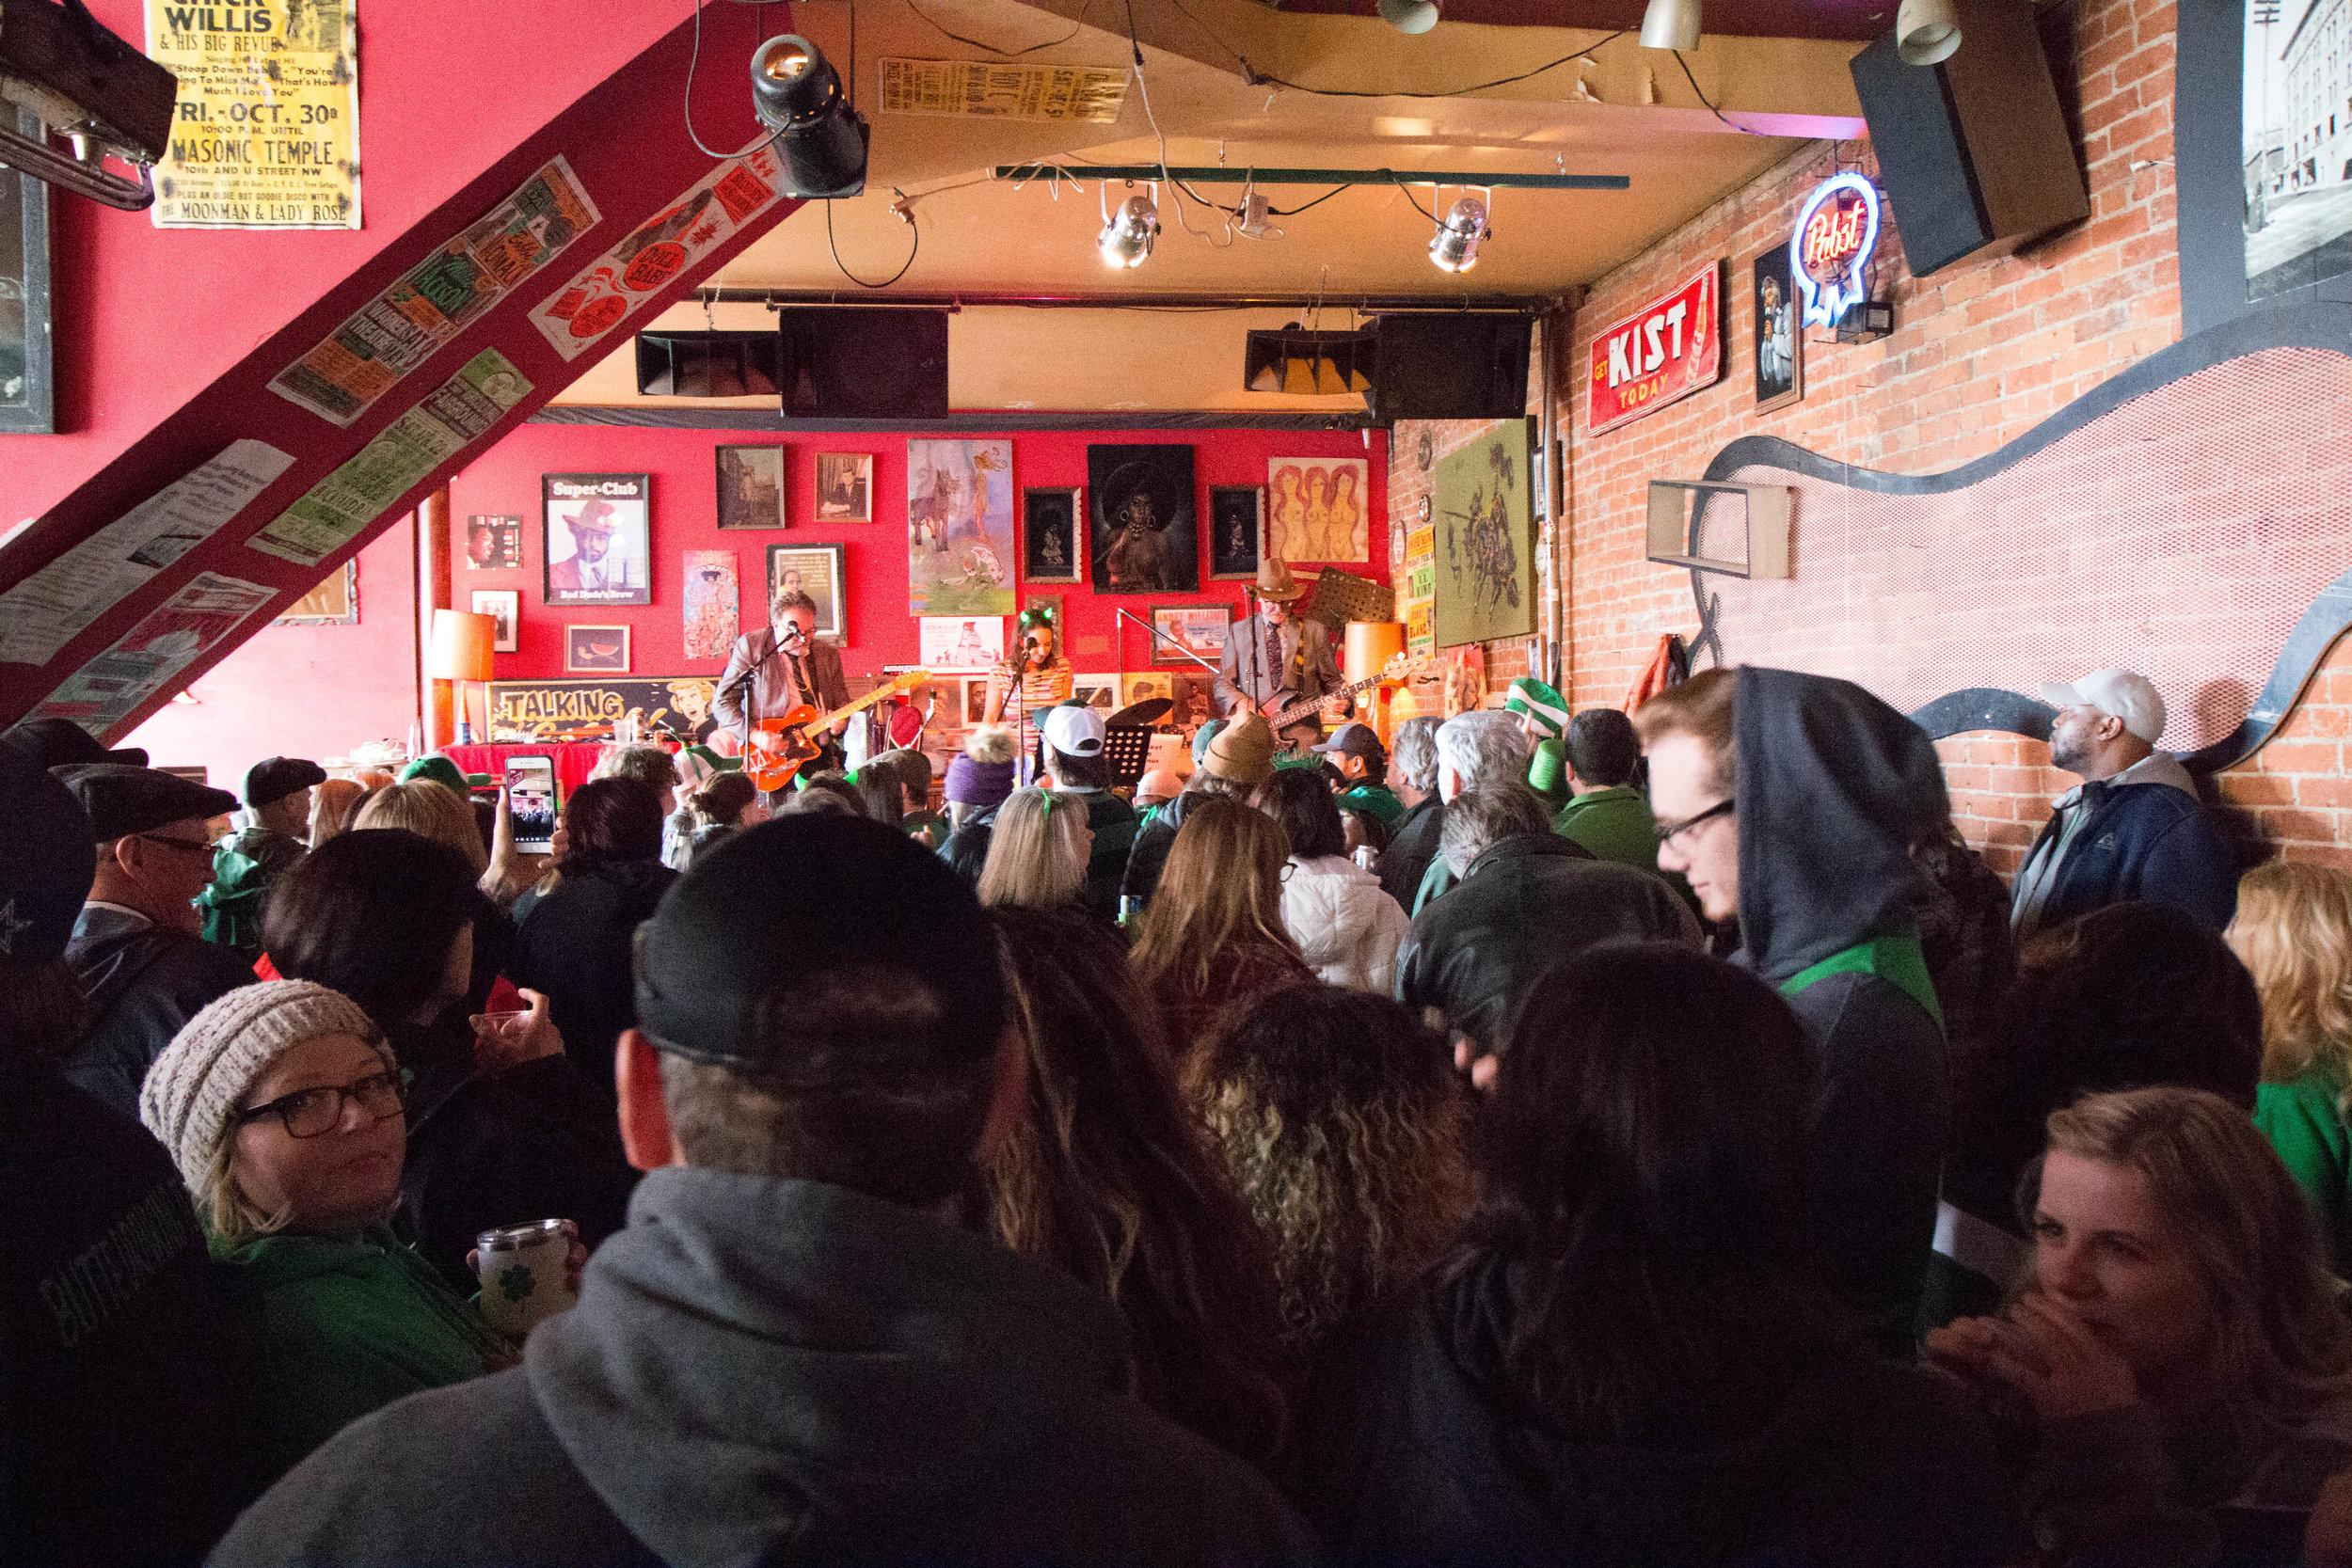 St. Patrick's Day Celebrations in Butte, Montana